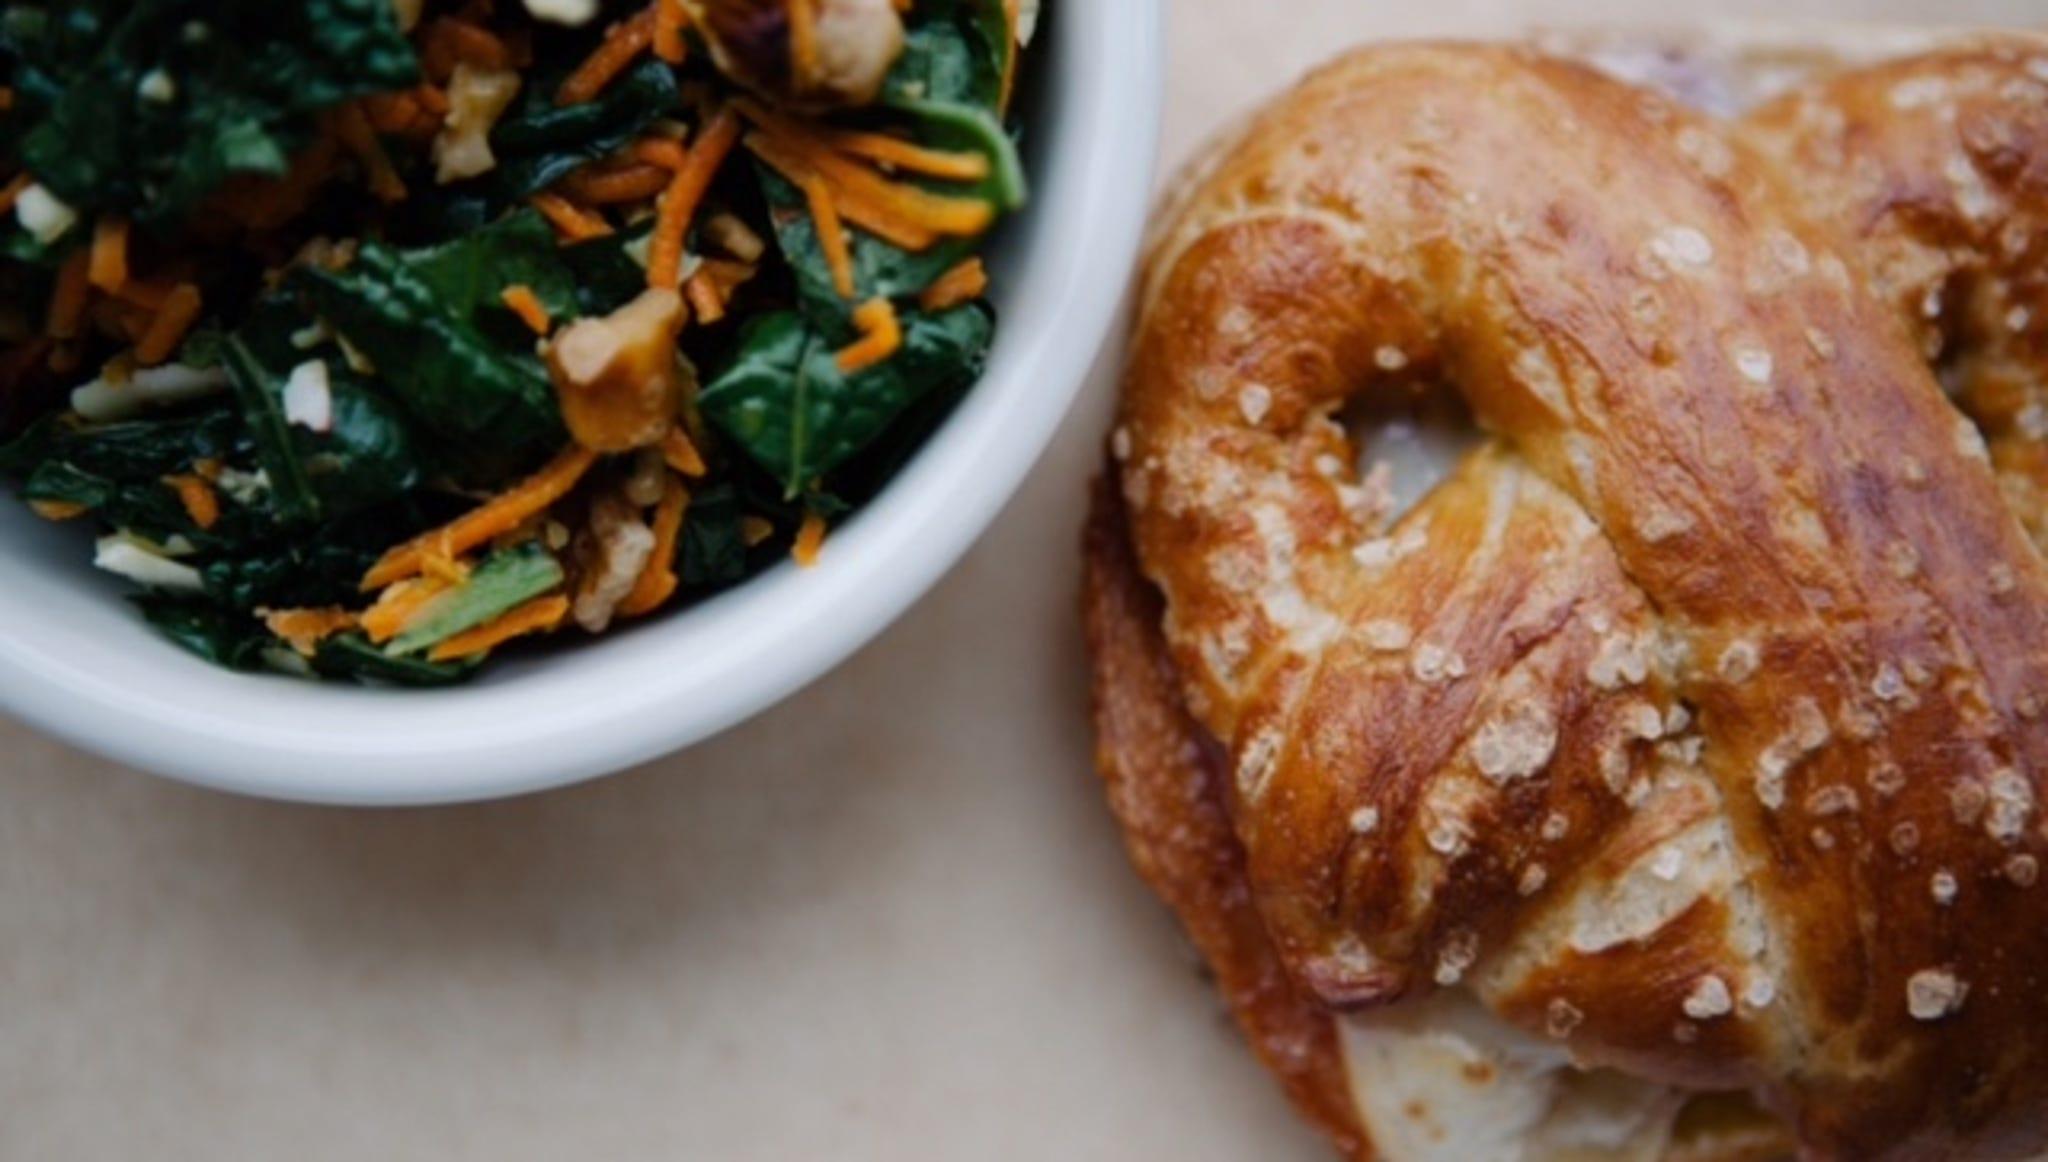 Although compact, San Francisco boasts thousands of world-class restaurants.